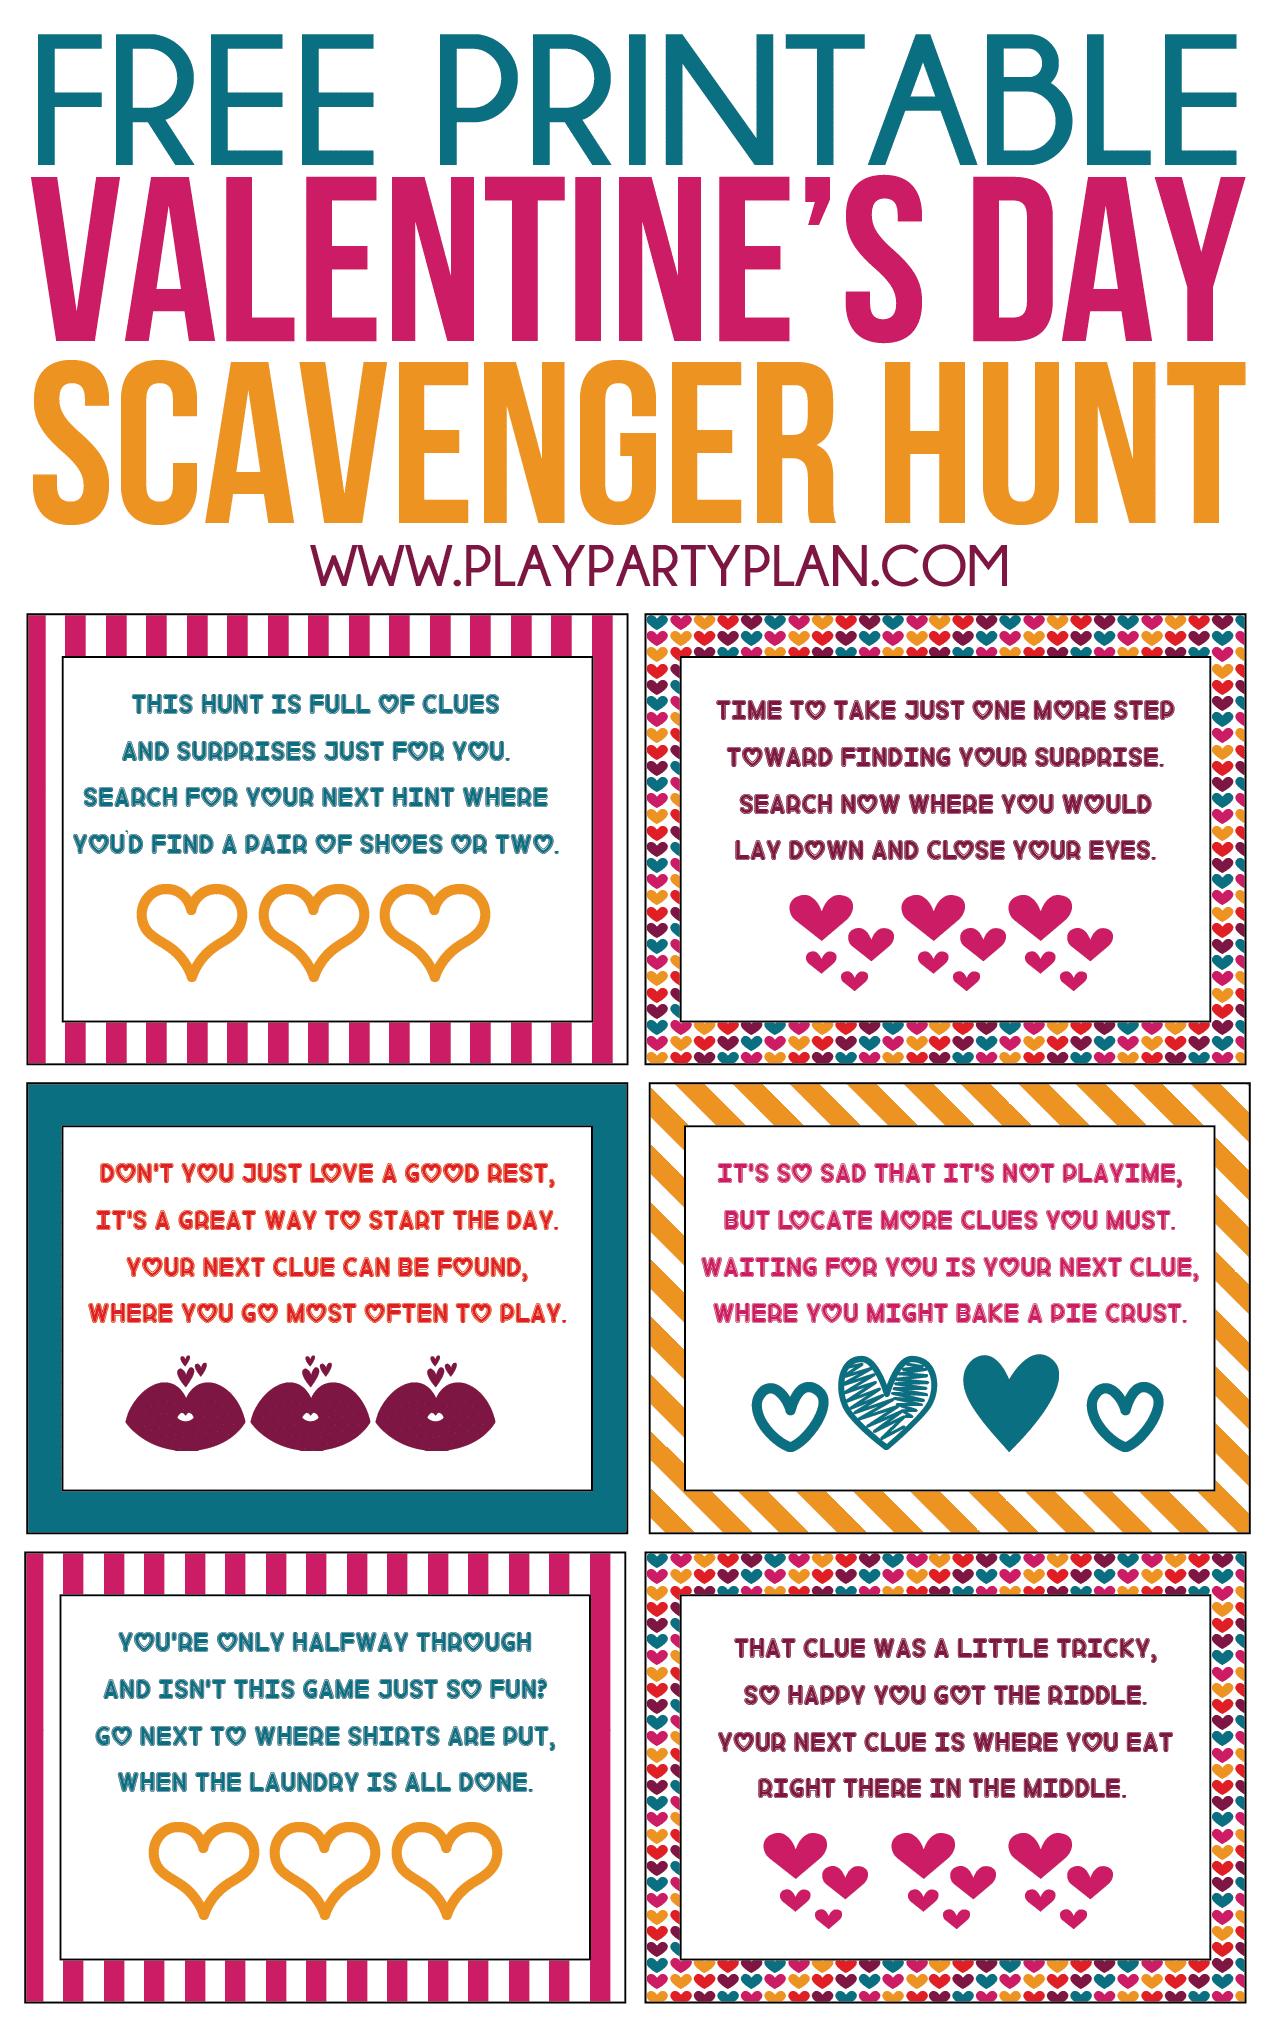 Free Printable Valentine's Day Scavenger Hunt Kids & Adults Will Love - Free Printable Valentine Cards For Husband